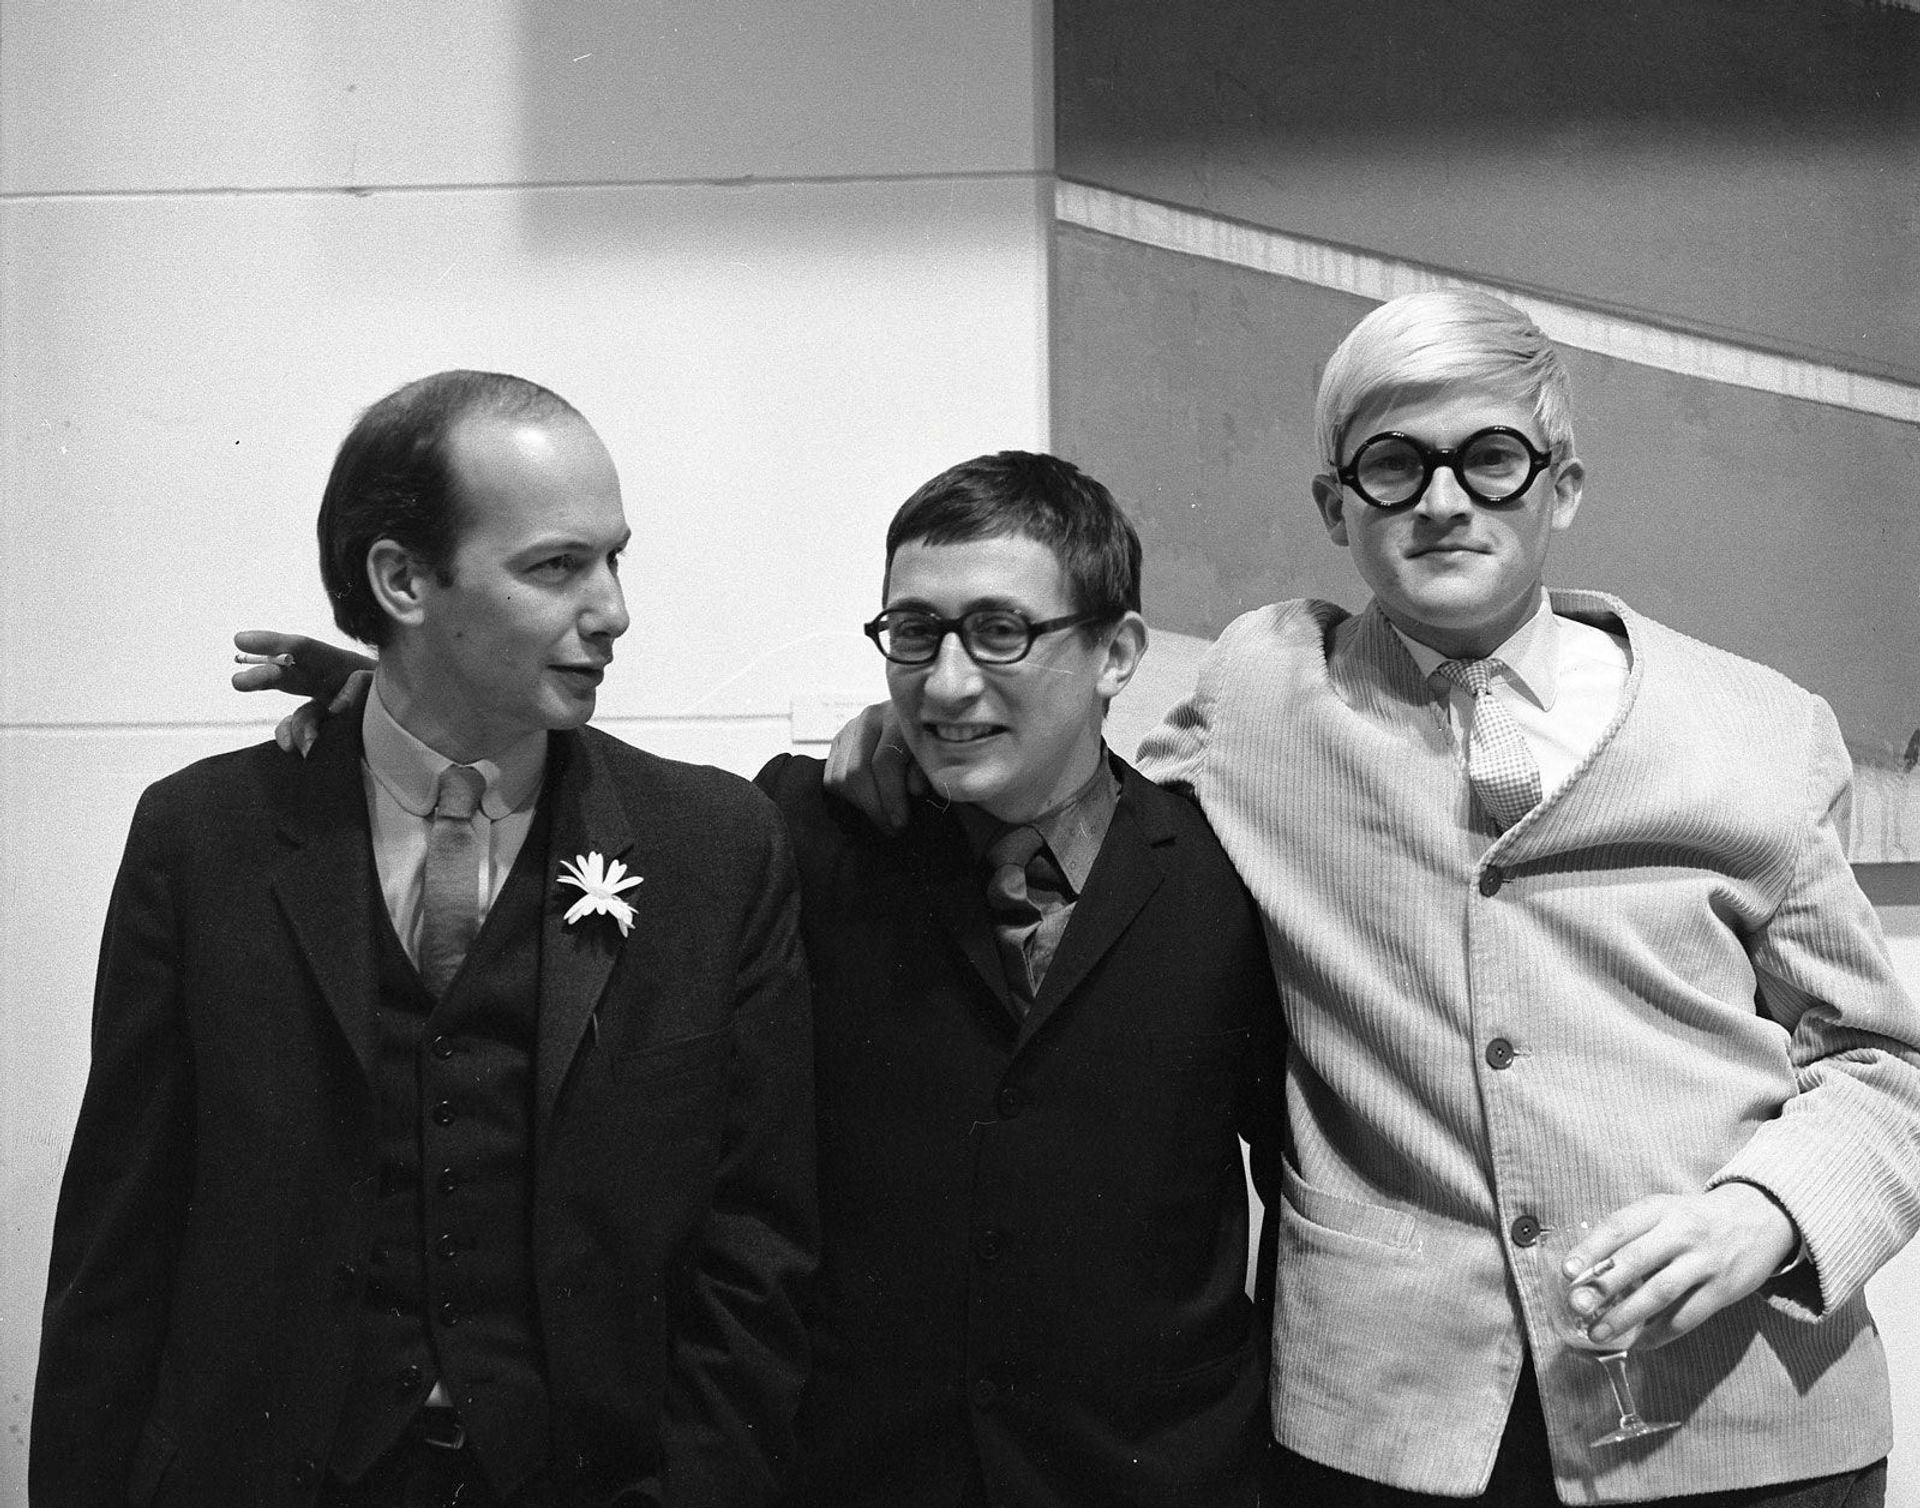 Richard Smith, John Kasmin and David Hockney were key players in the London art scene of the 1960s © Walker Art Center